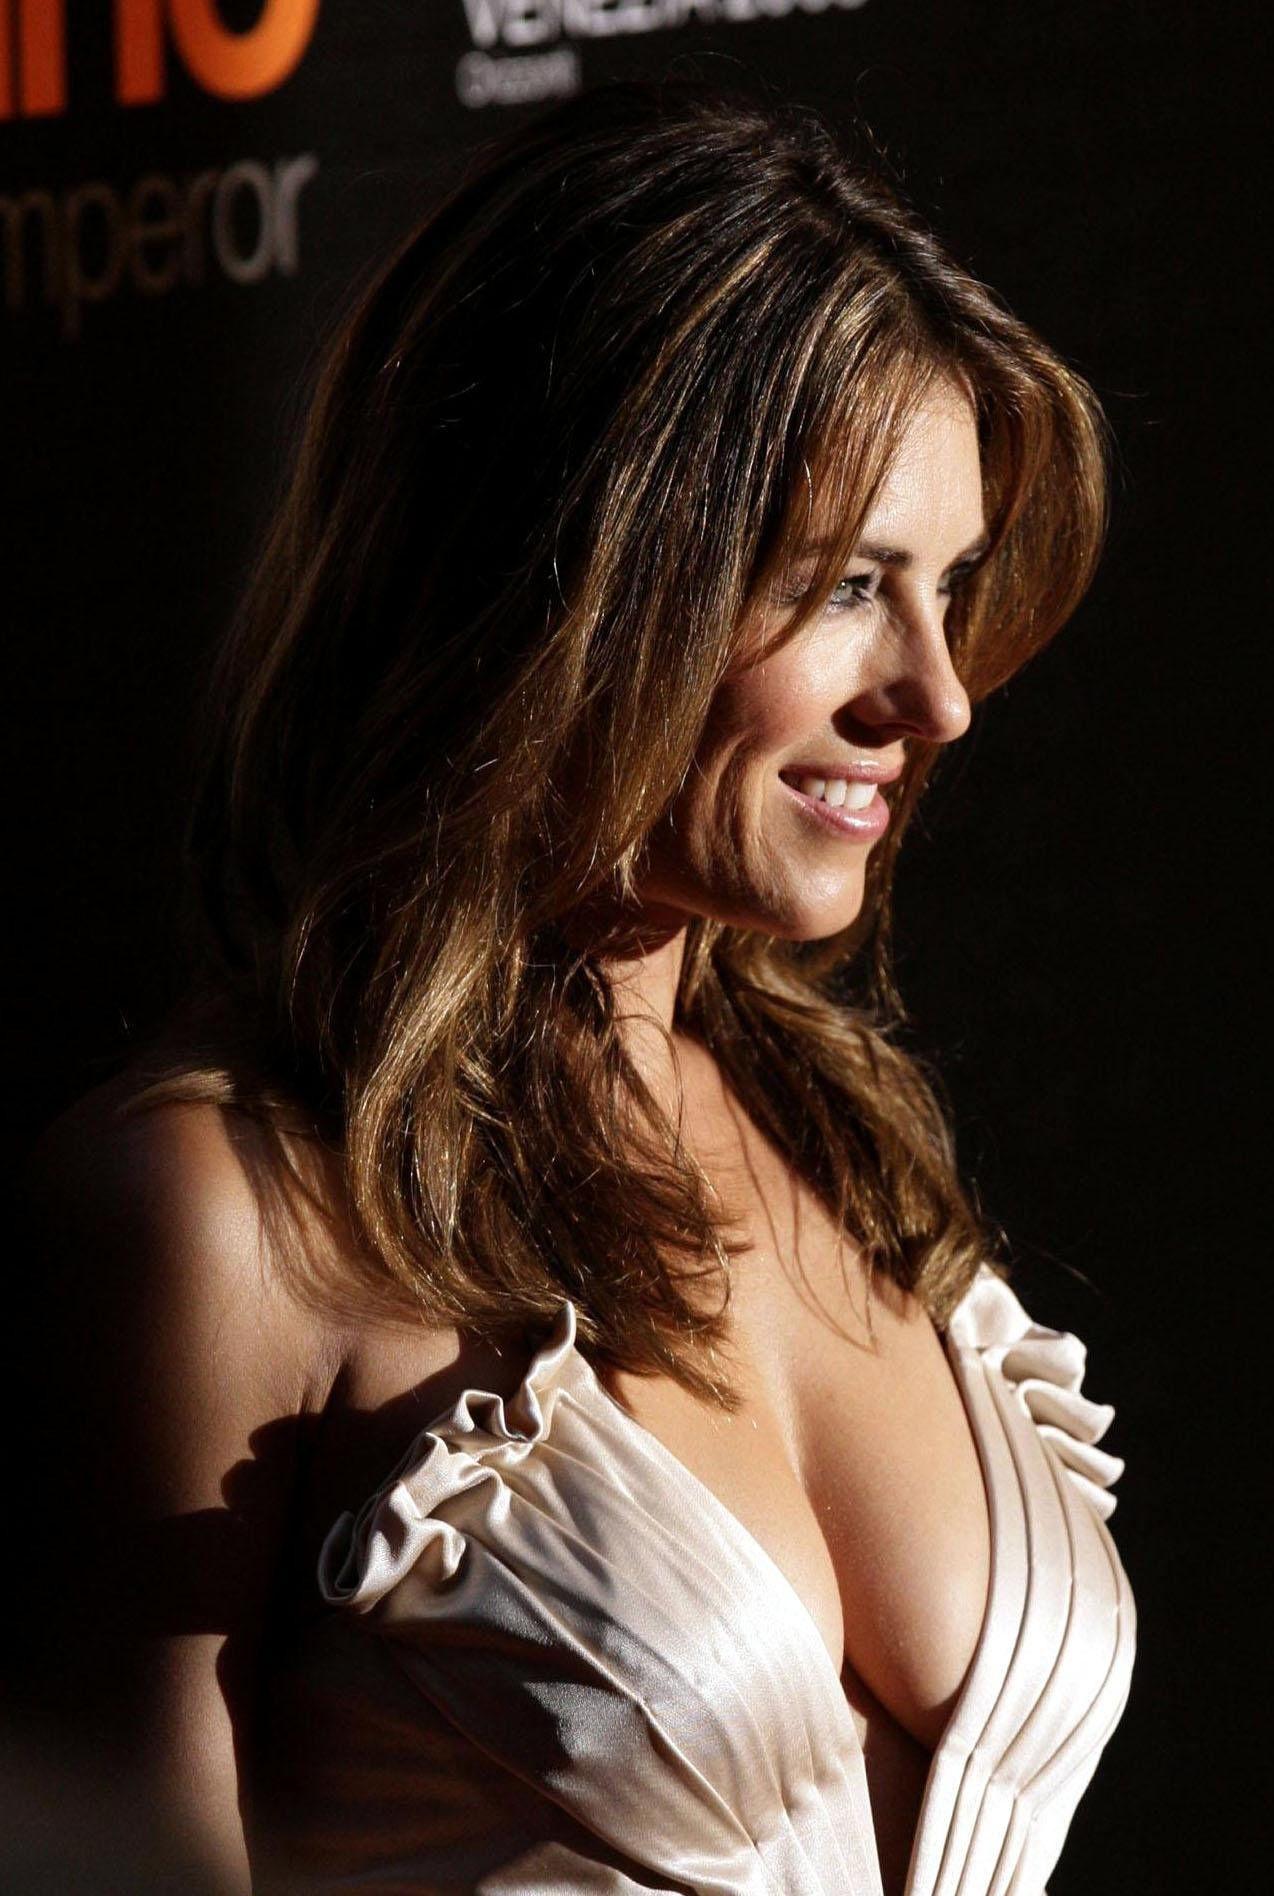 Liz Hurley   Elizabeth hurley, Britische schauspieler, Schauspieler